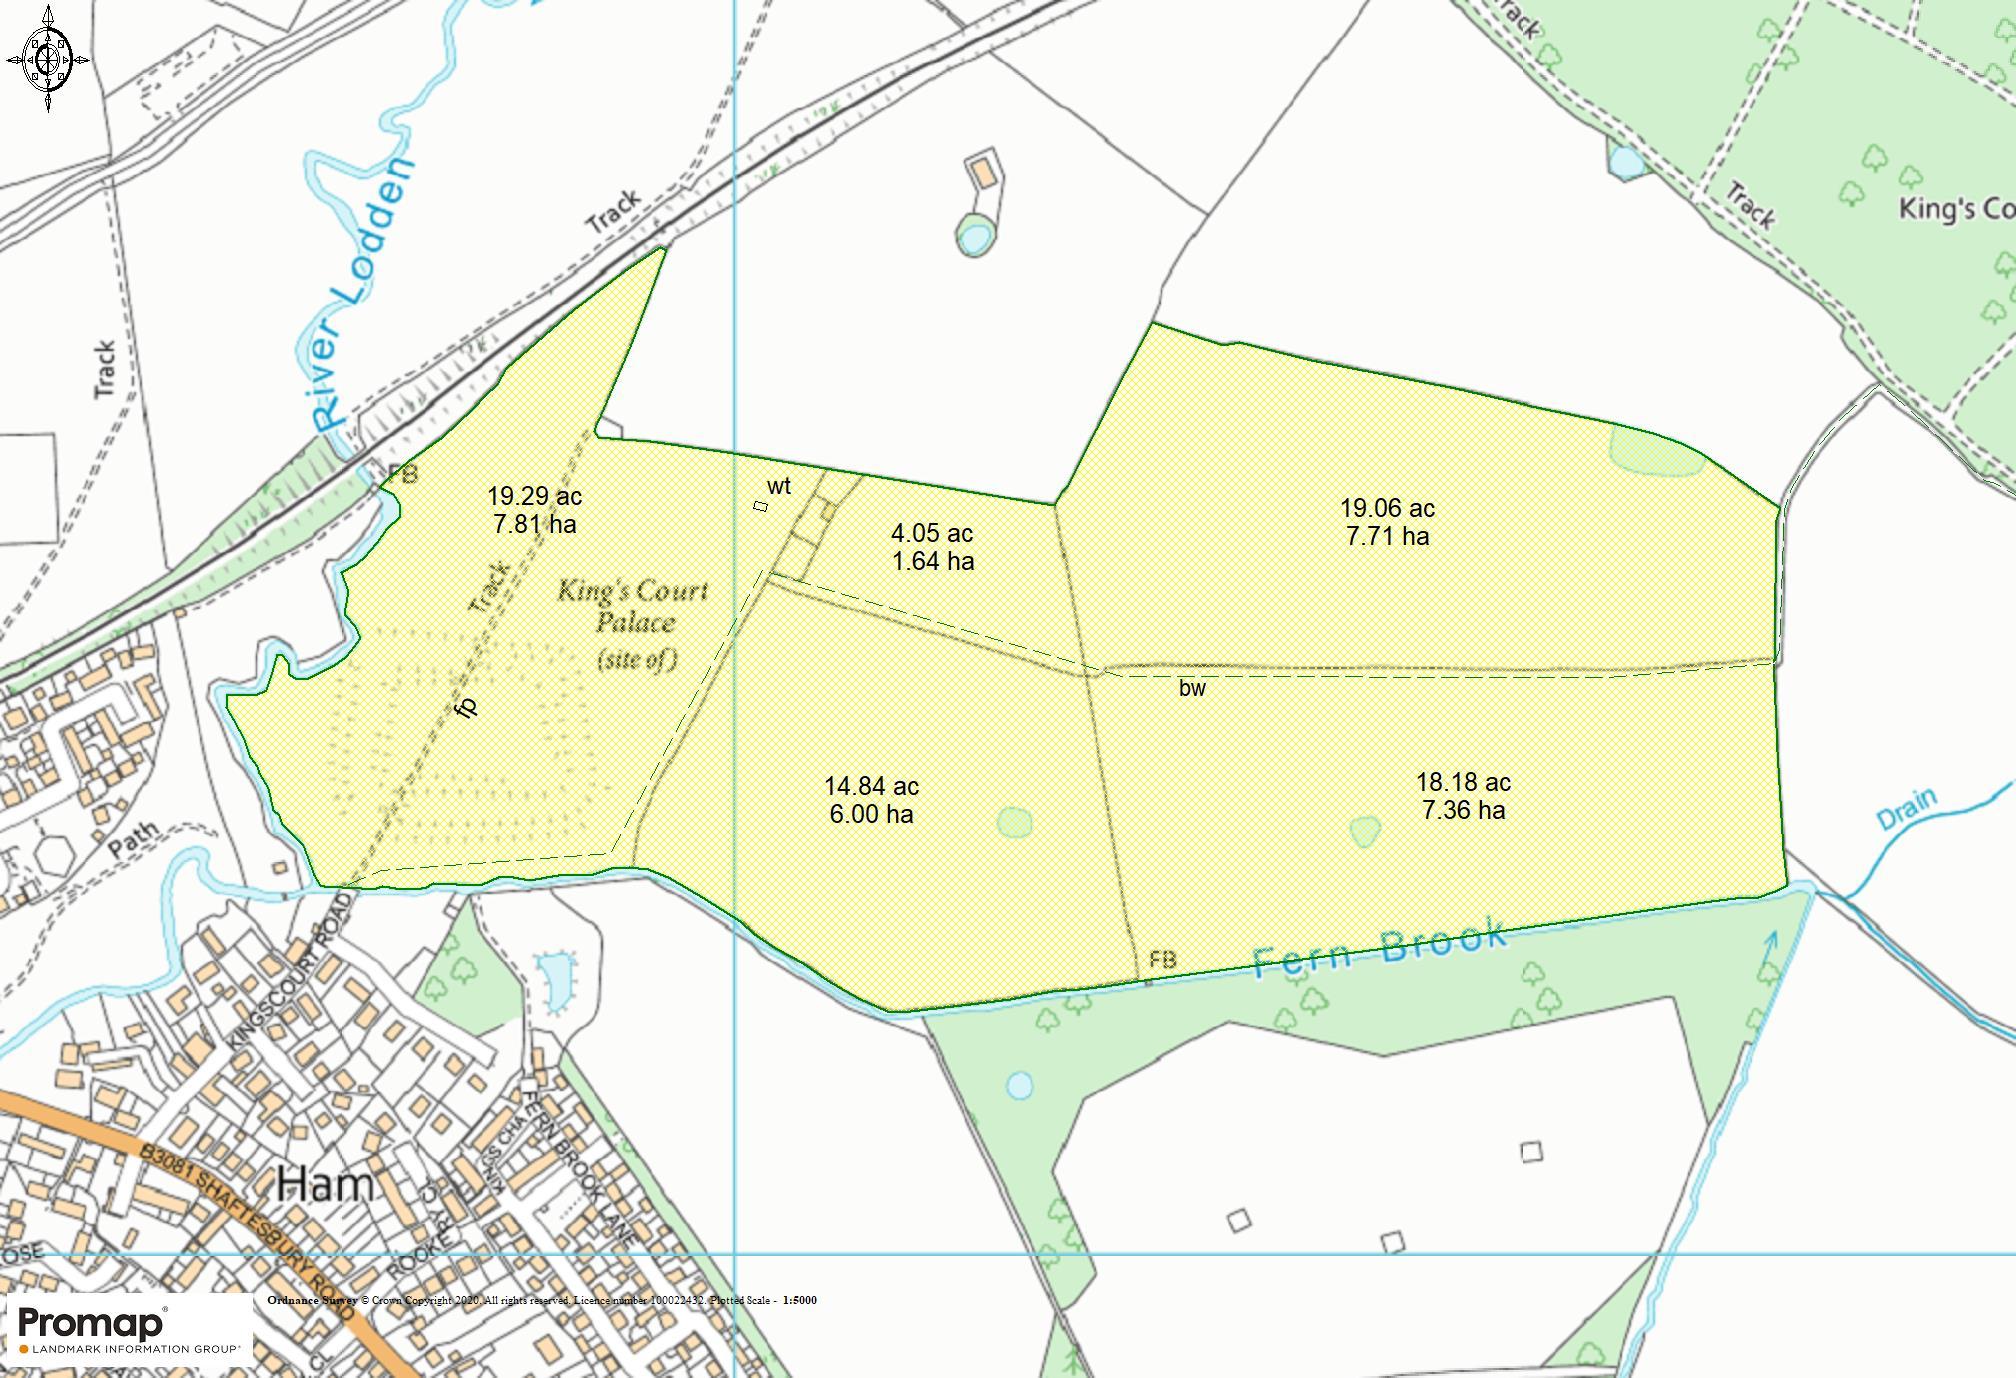 Floorplan - Land At Kings Court Palace, Gillingham, Dorset, SP8 4LD